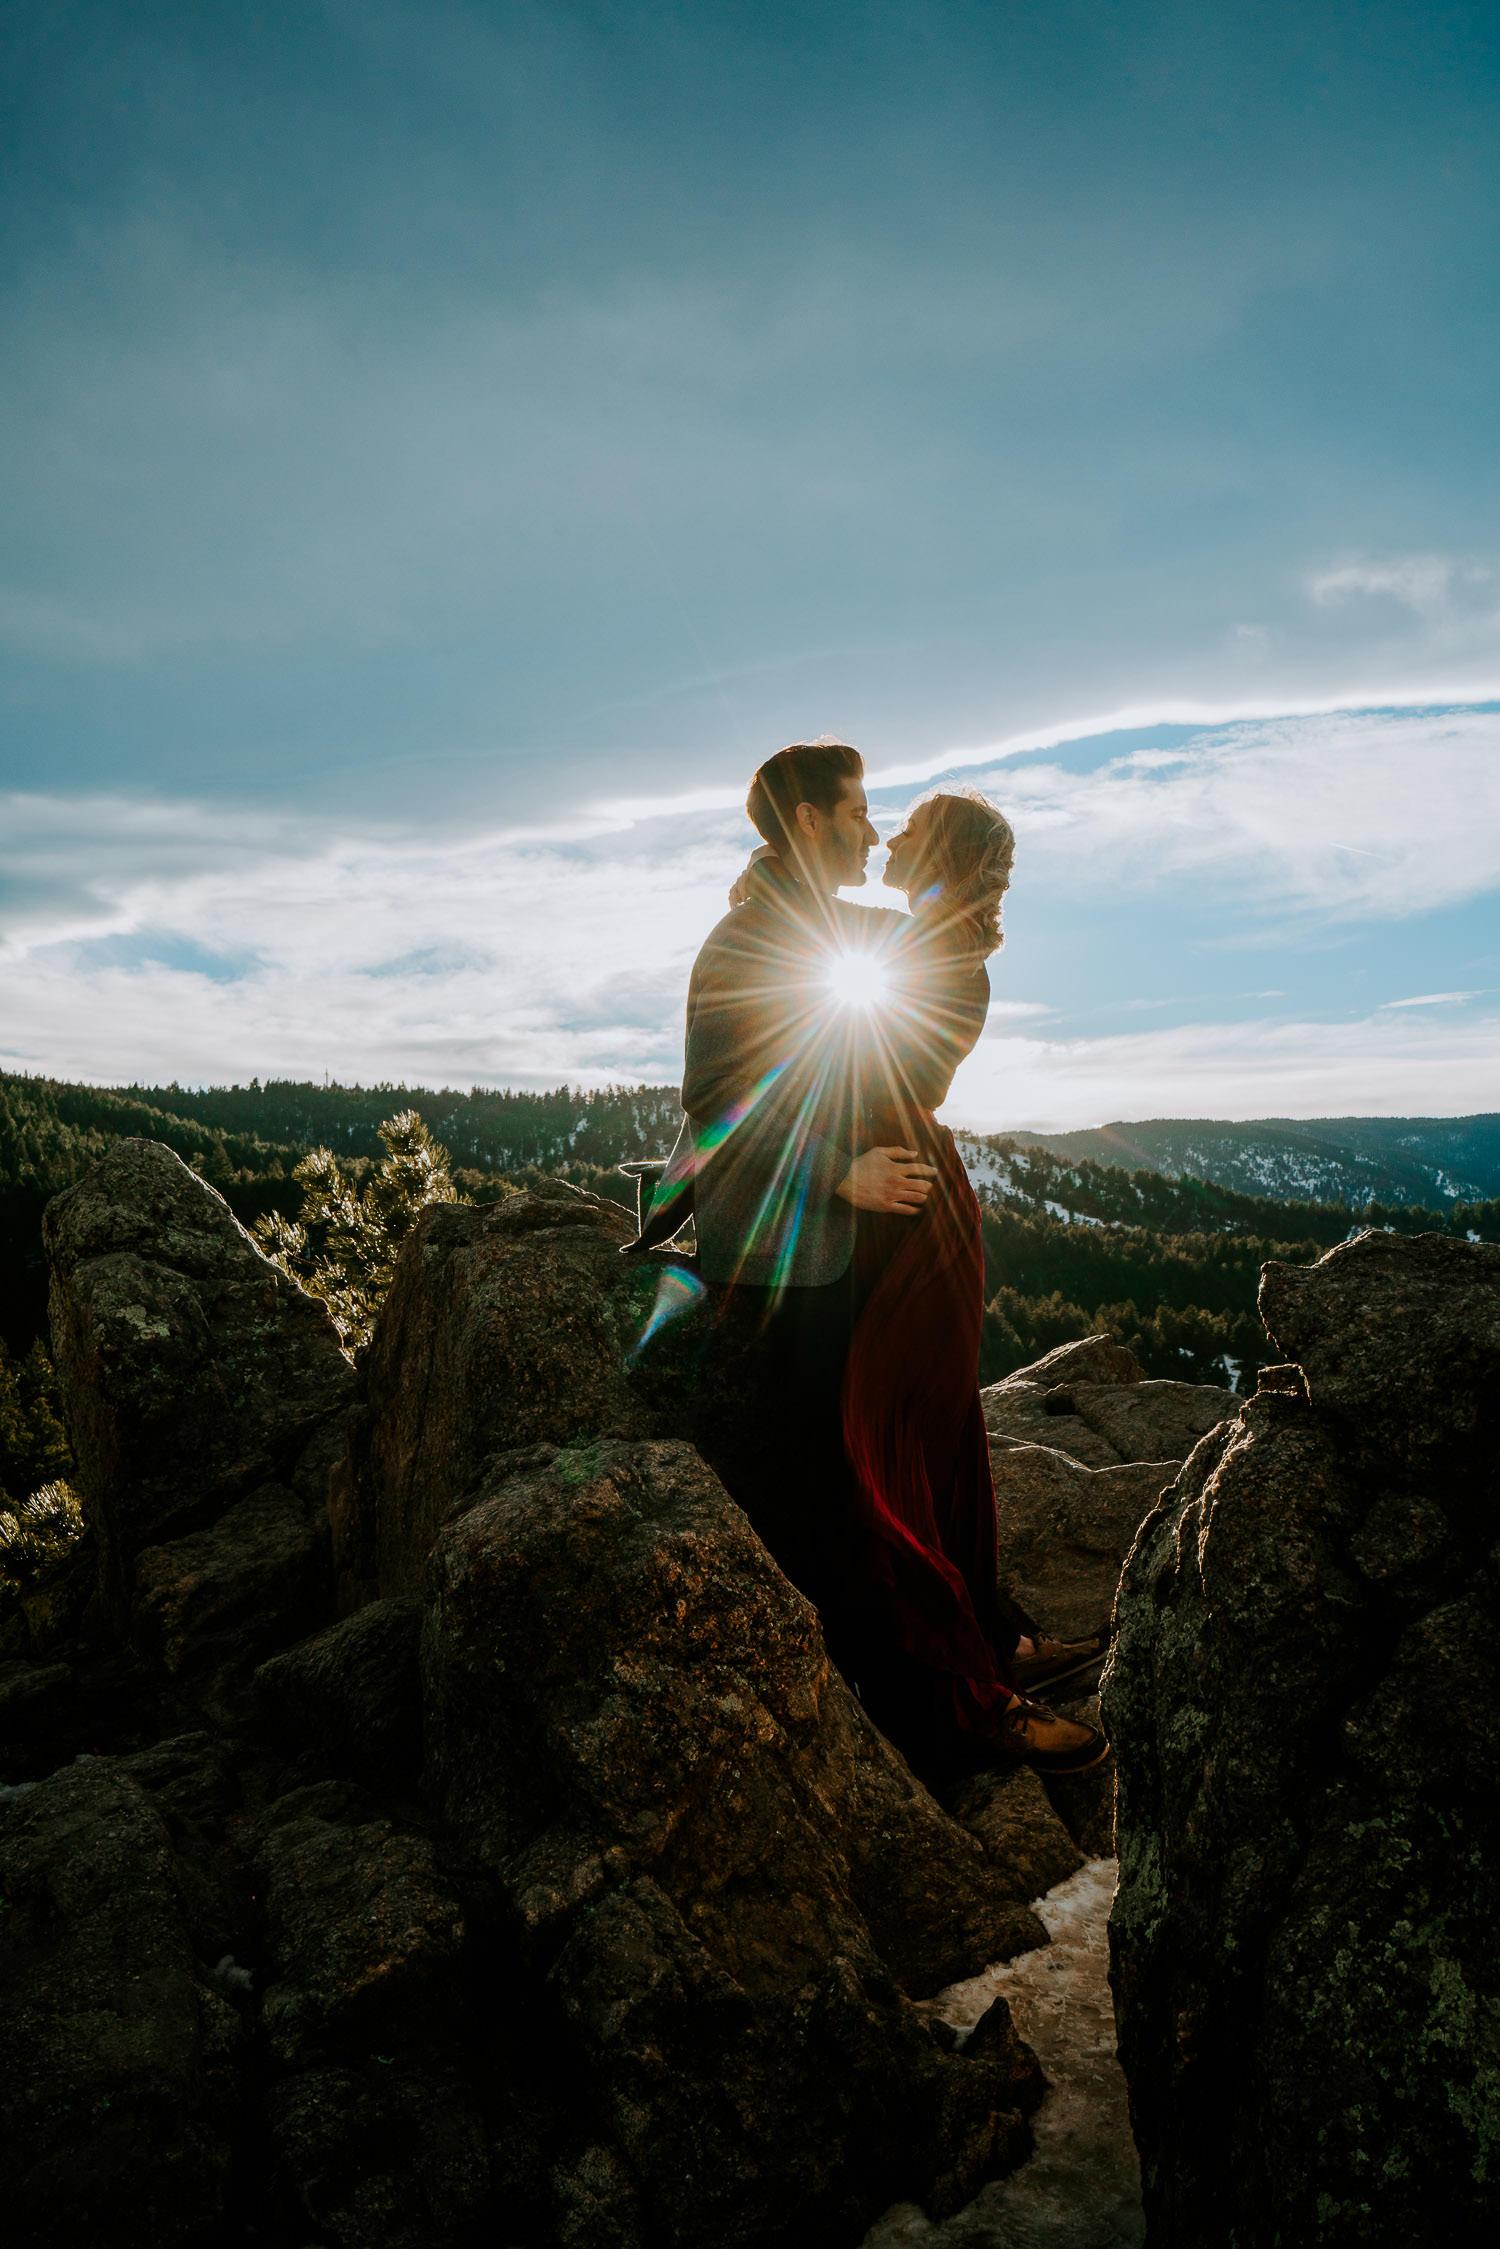 Boulder Adventurous Engagement, Boulder Engagement Photographer, Colorado Engagement Photographer, Colorado Couples Photography, Adventure Couples Photography, Lost Gulch lookout